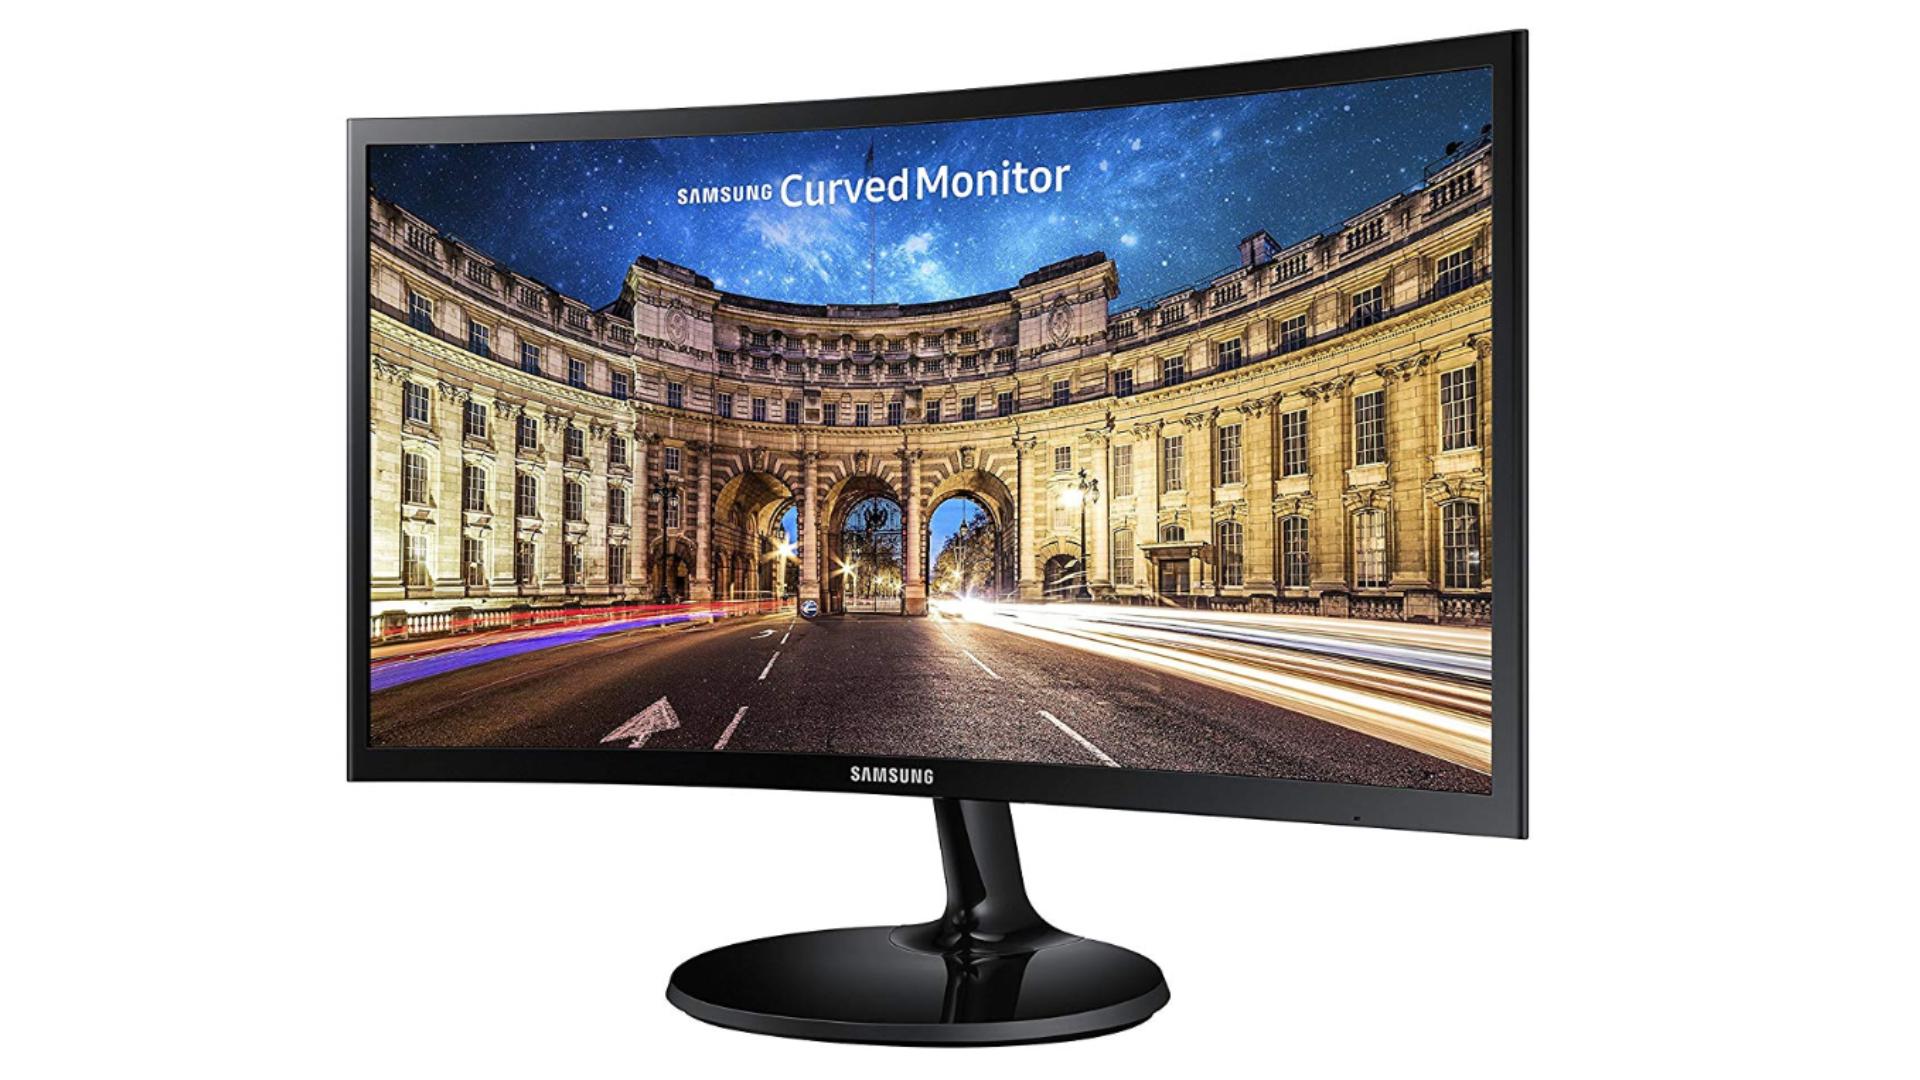 Samsung curved Monitor para PC Desktop de 24